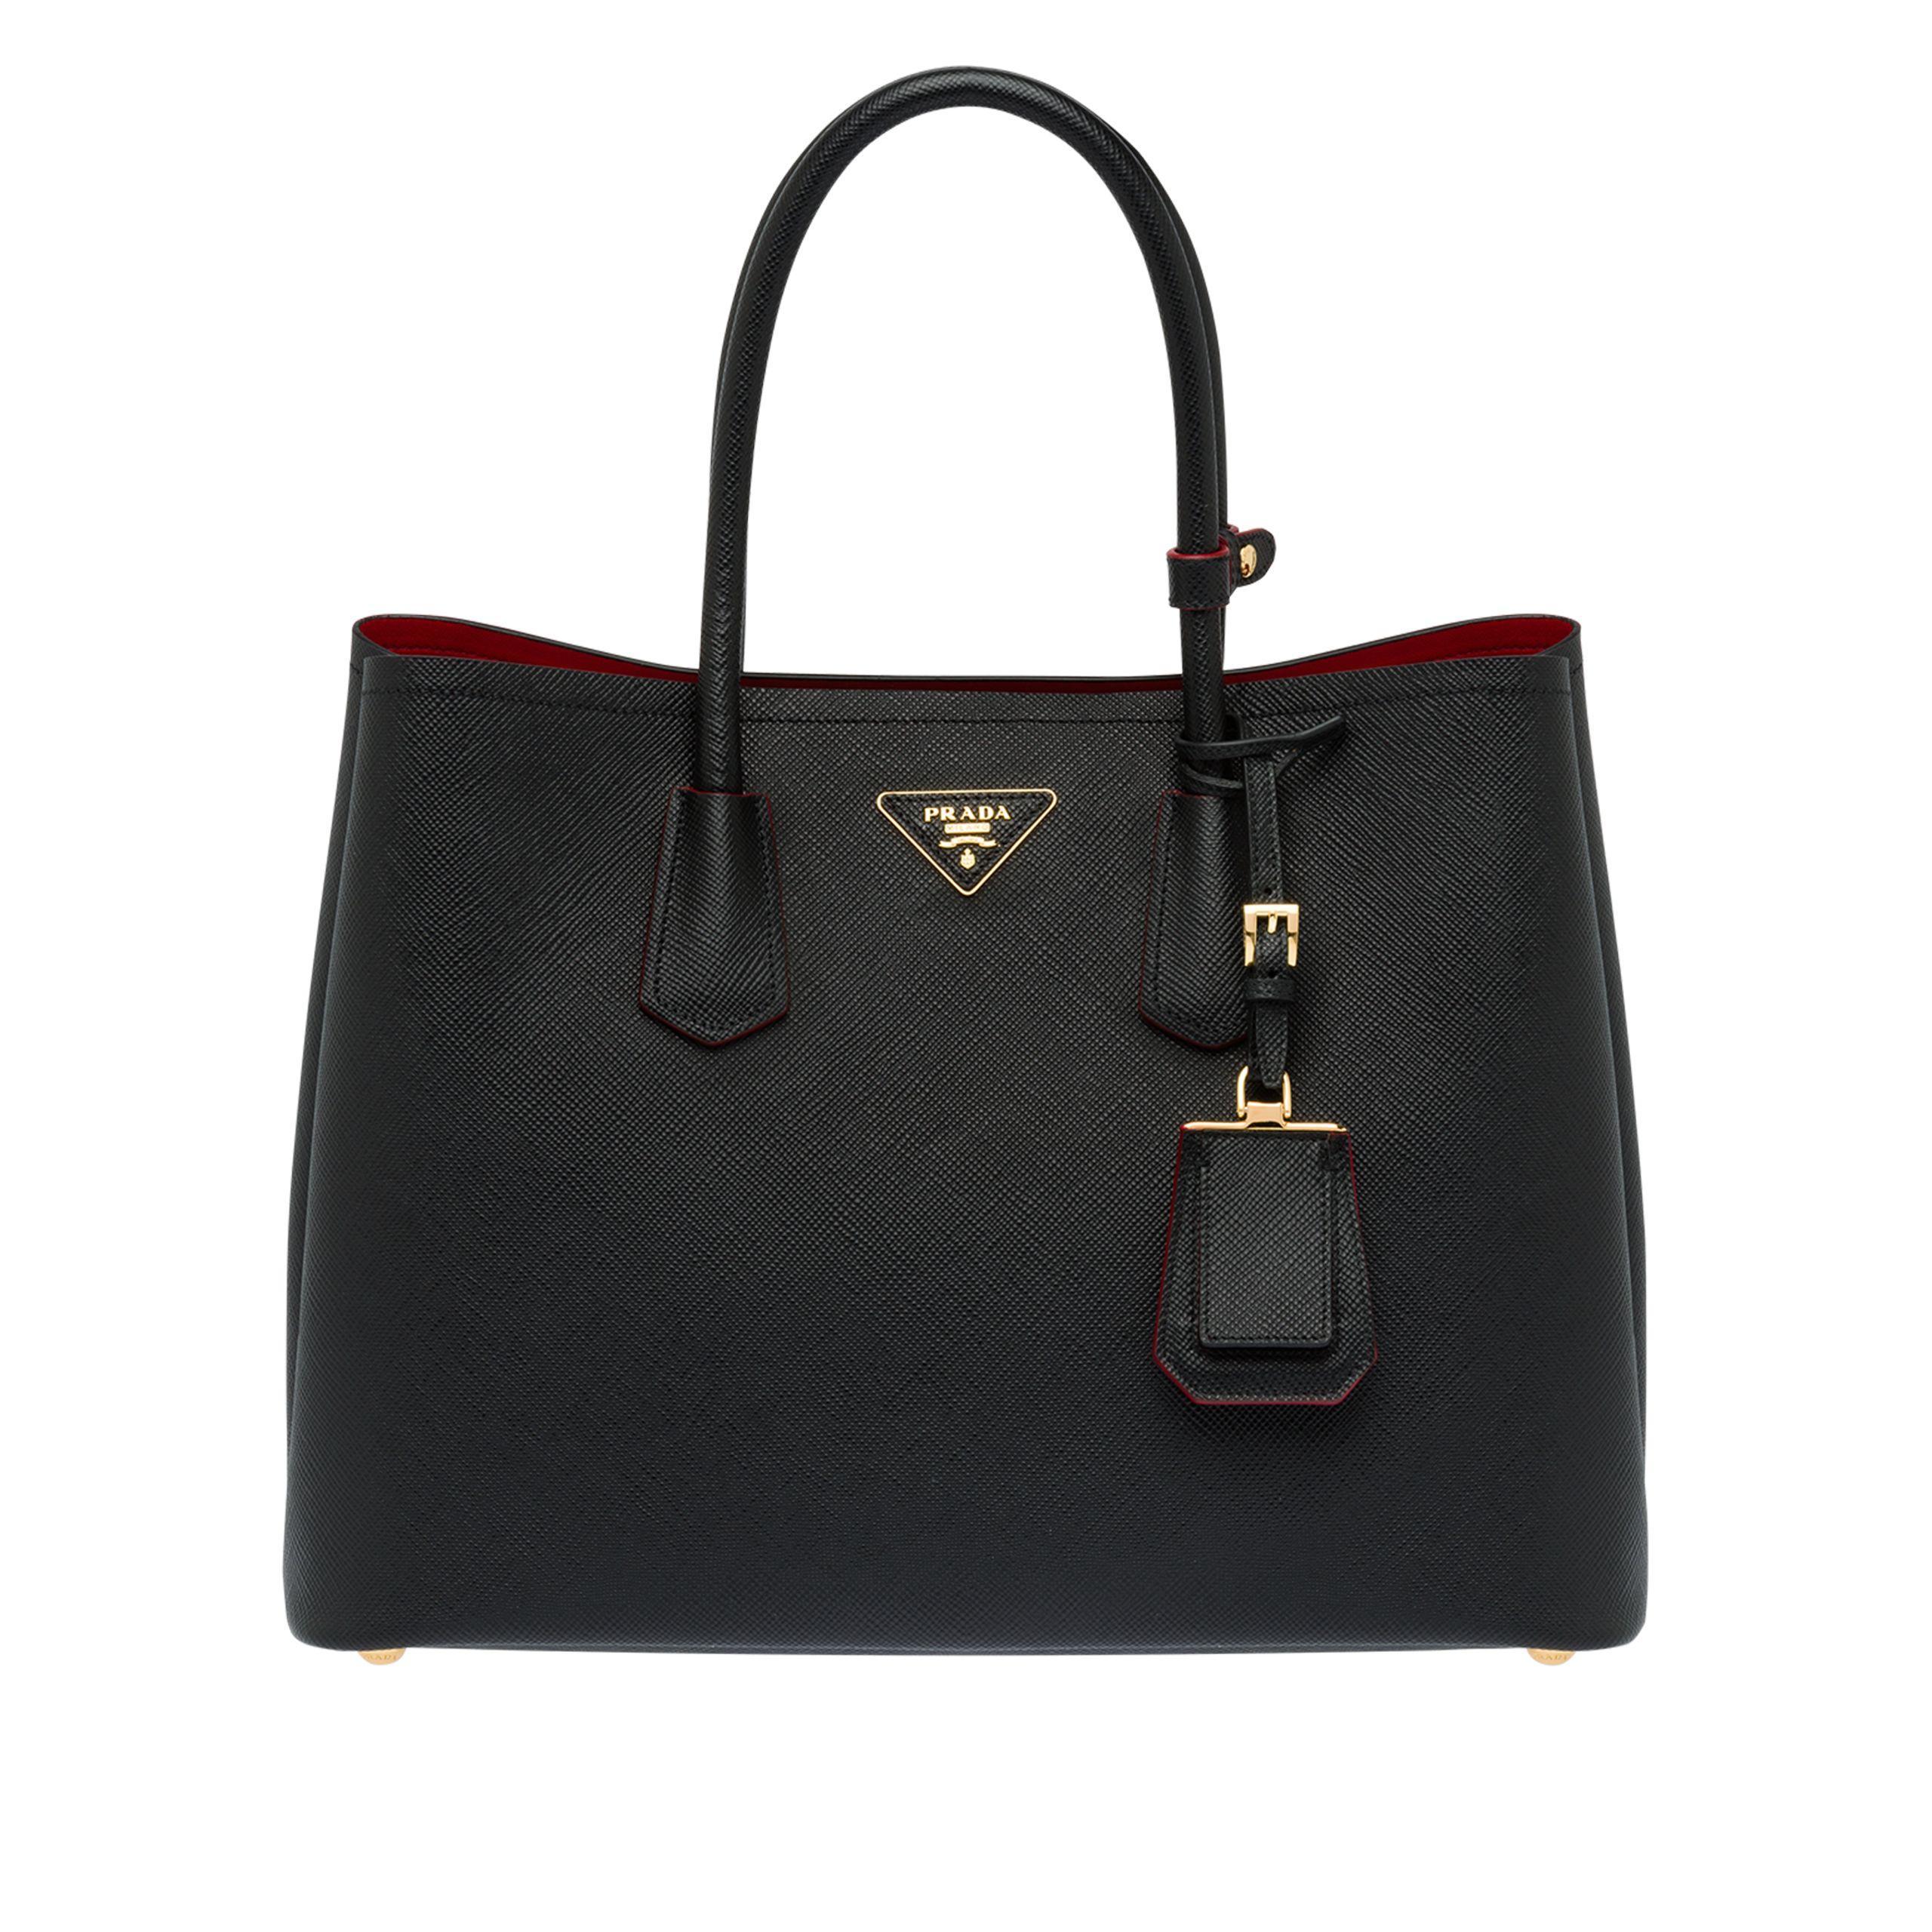 08174ade6502 Prada. Women s Black Double Bag Large.  2